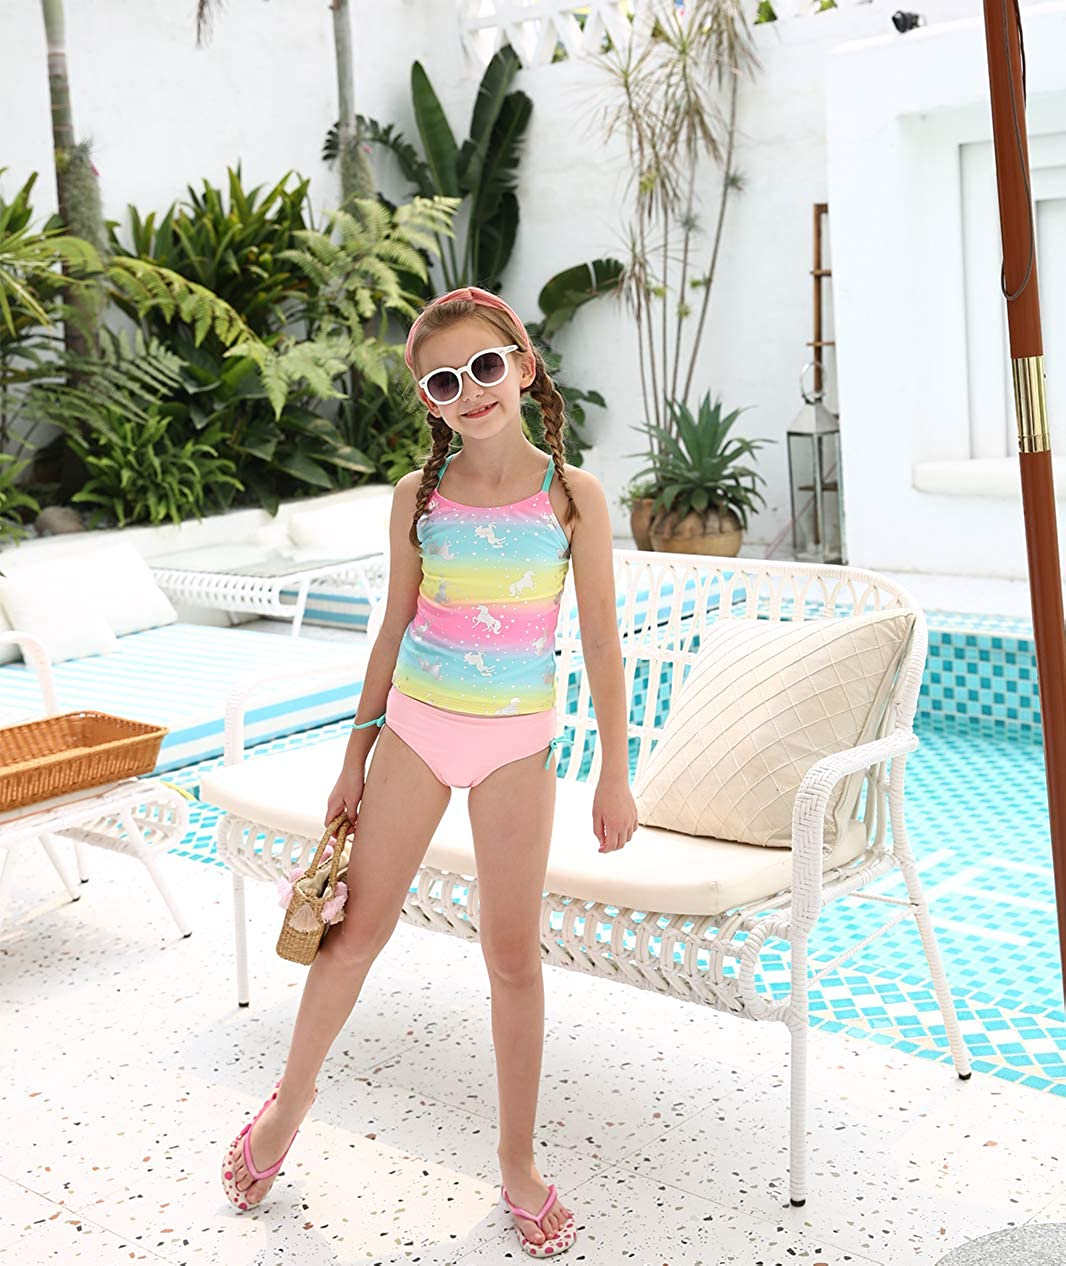 BELLOO Girls Tankini Set Swimsuits Two Pieces Bathing Suit Swimwear